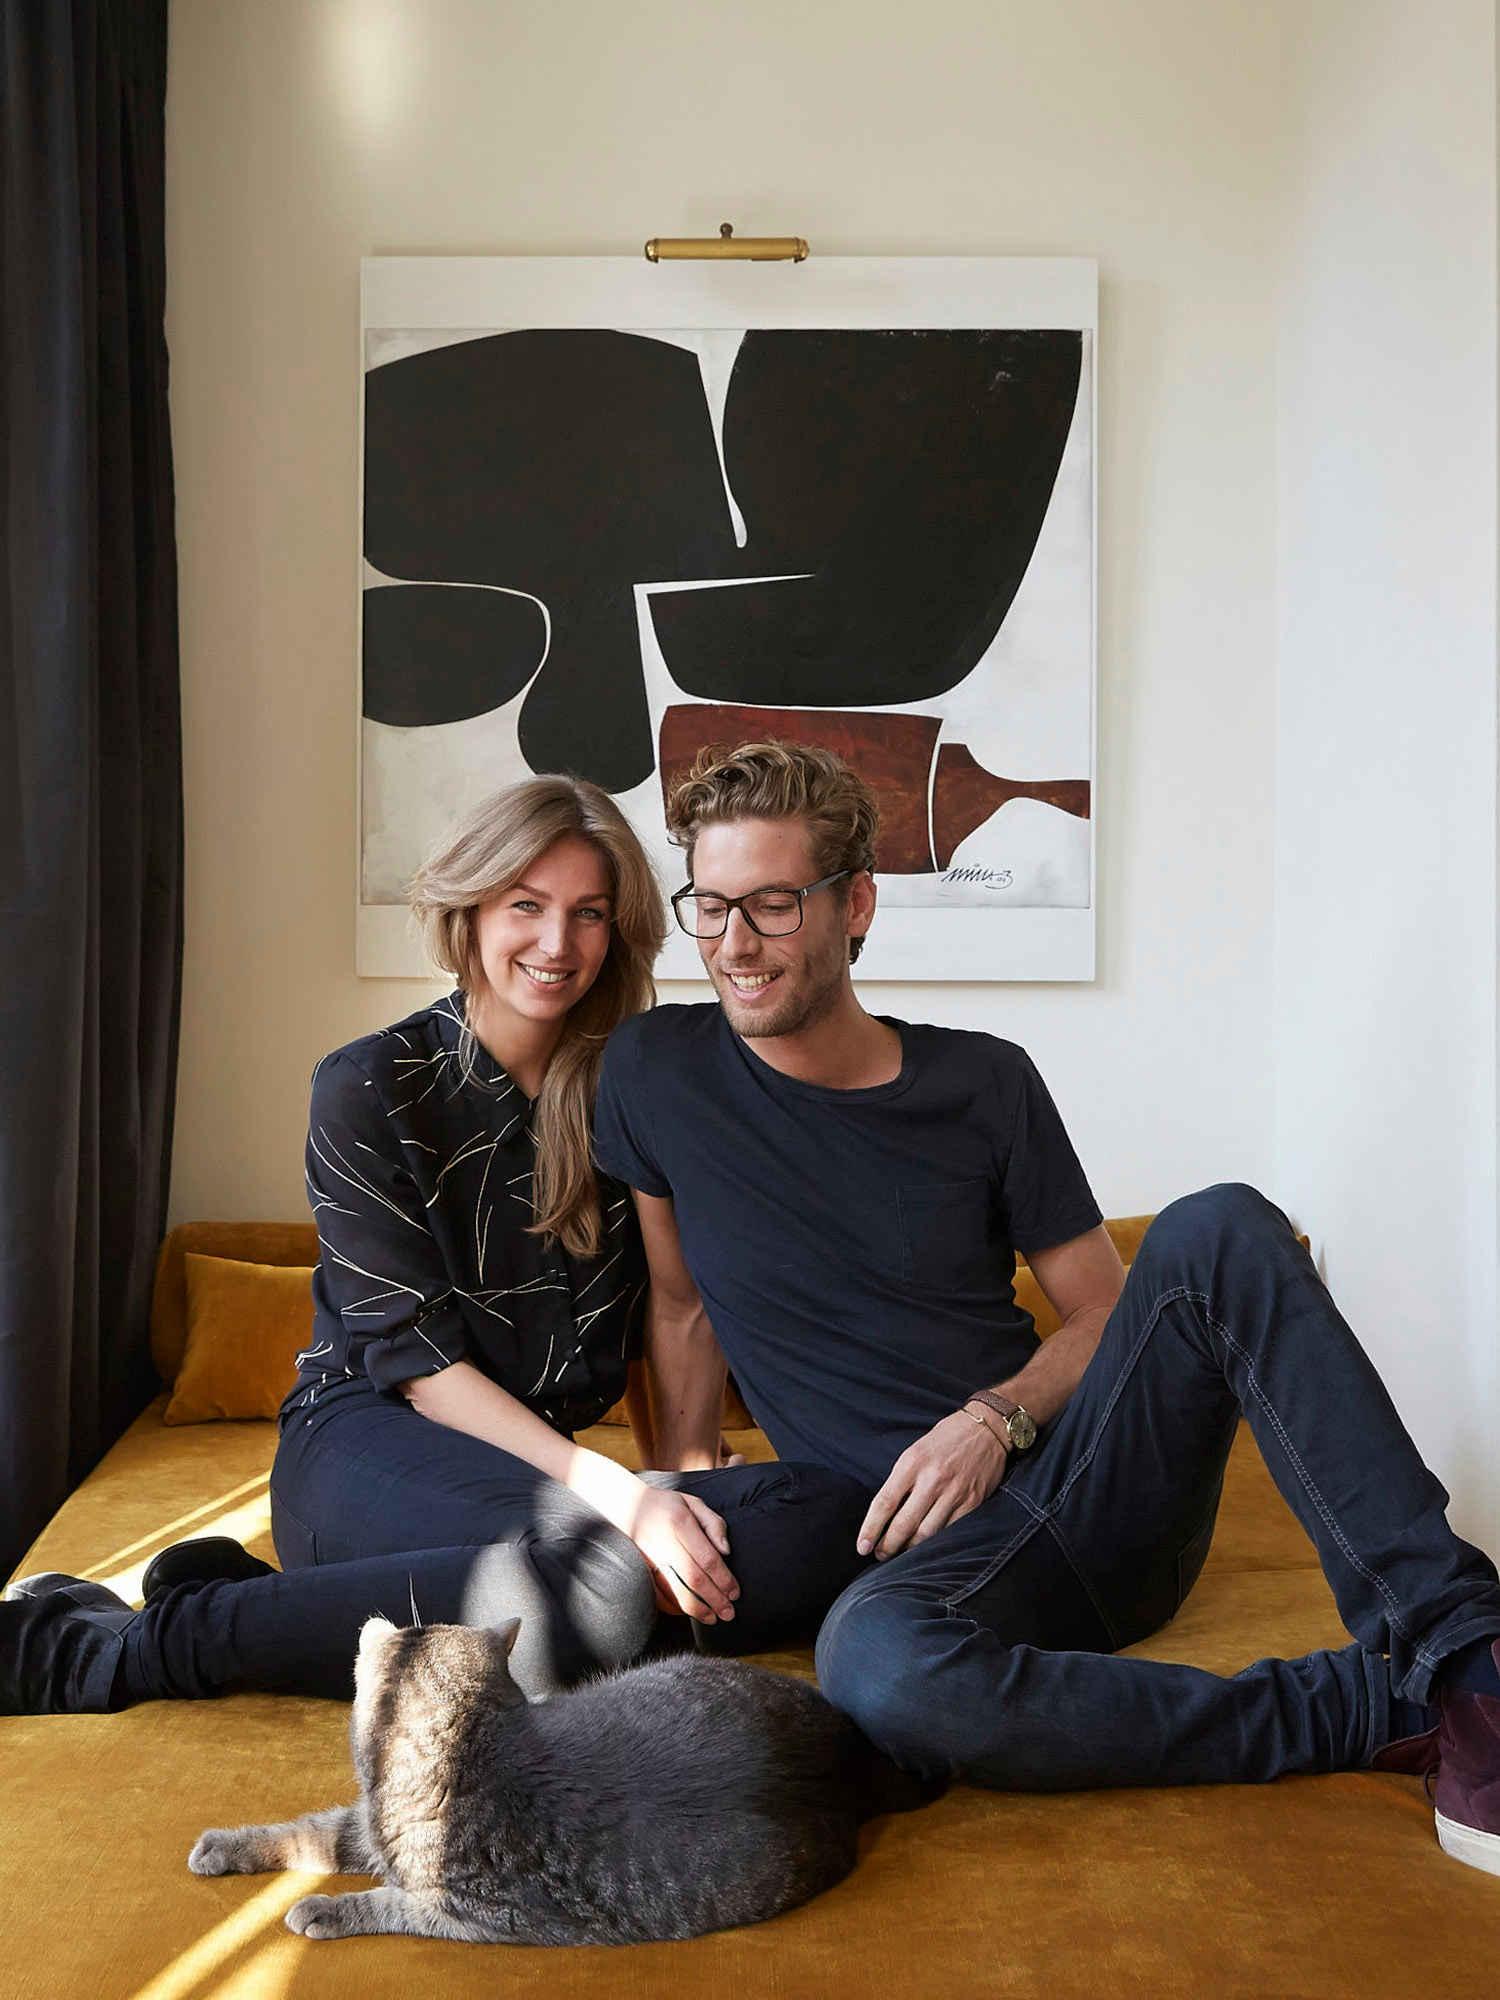 The Nicemakers: Joyce Urbanus & Dax Roll